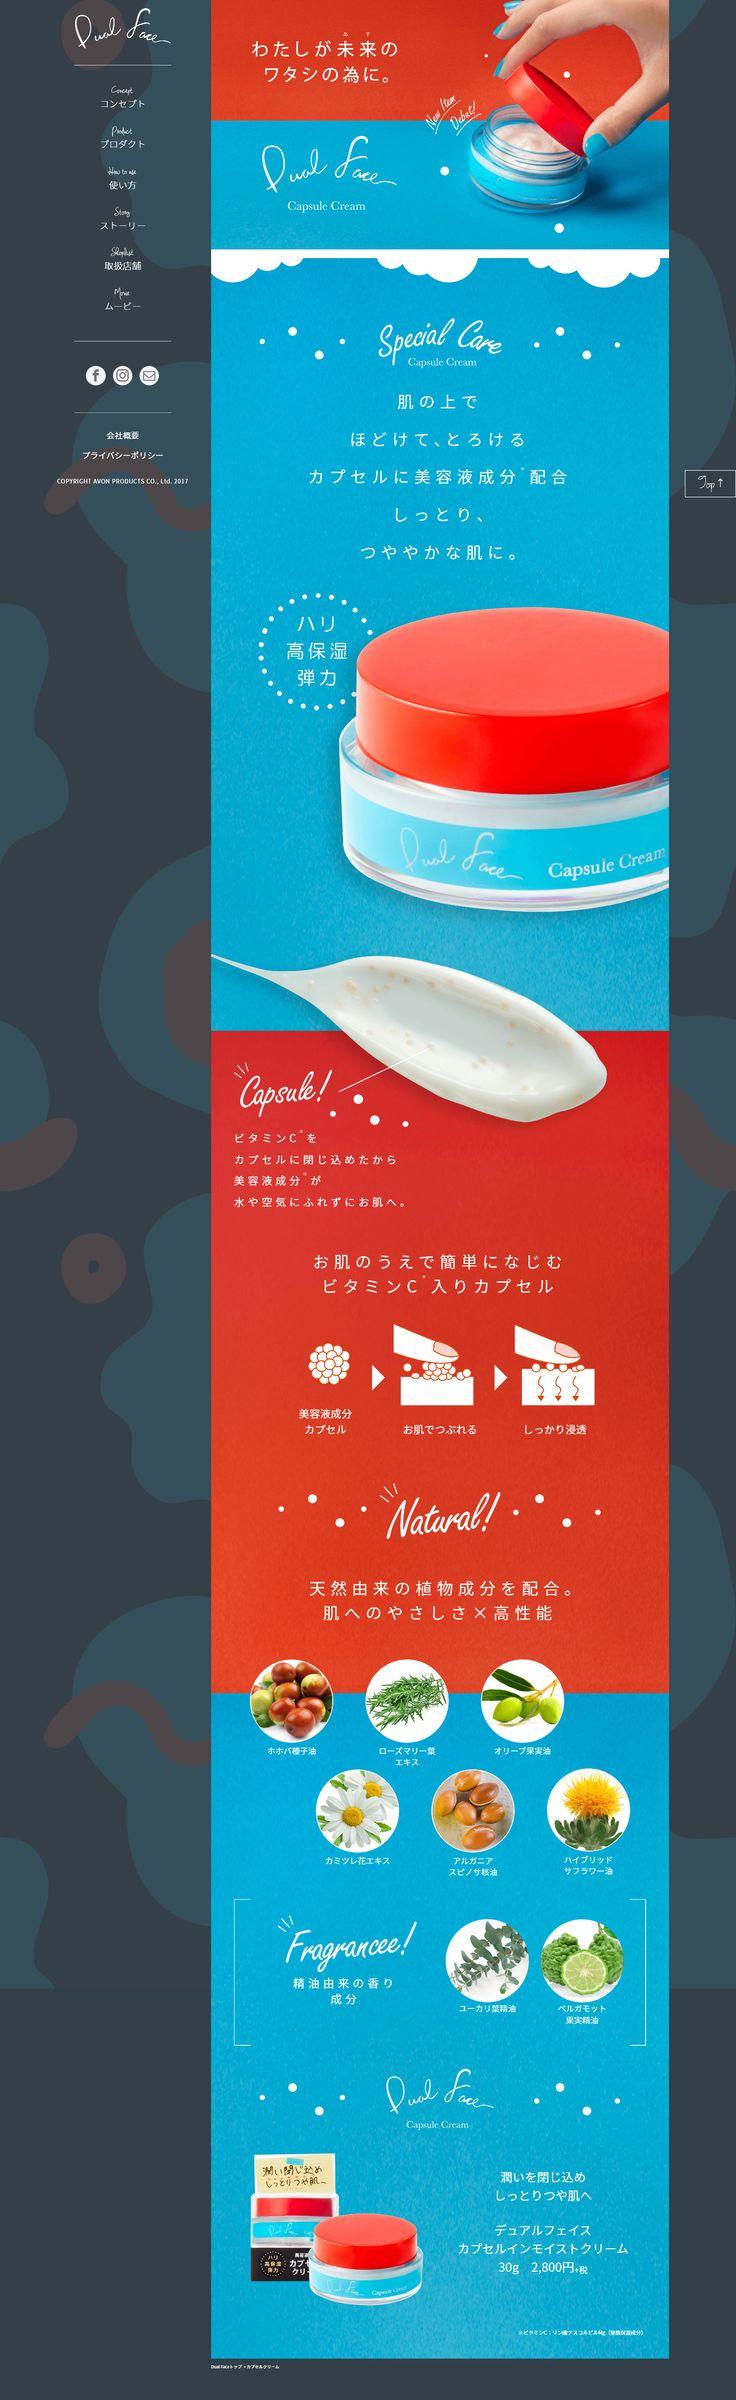 Screenshot-2017-11-21 Capsule Cream - カプセルクリーム Dual Face(デュアルフェイス) https://screenshots.firefox.com/x0ek6OZbMqpbJl3f/dual-face.com